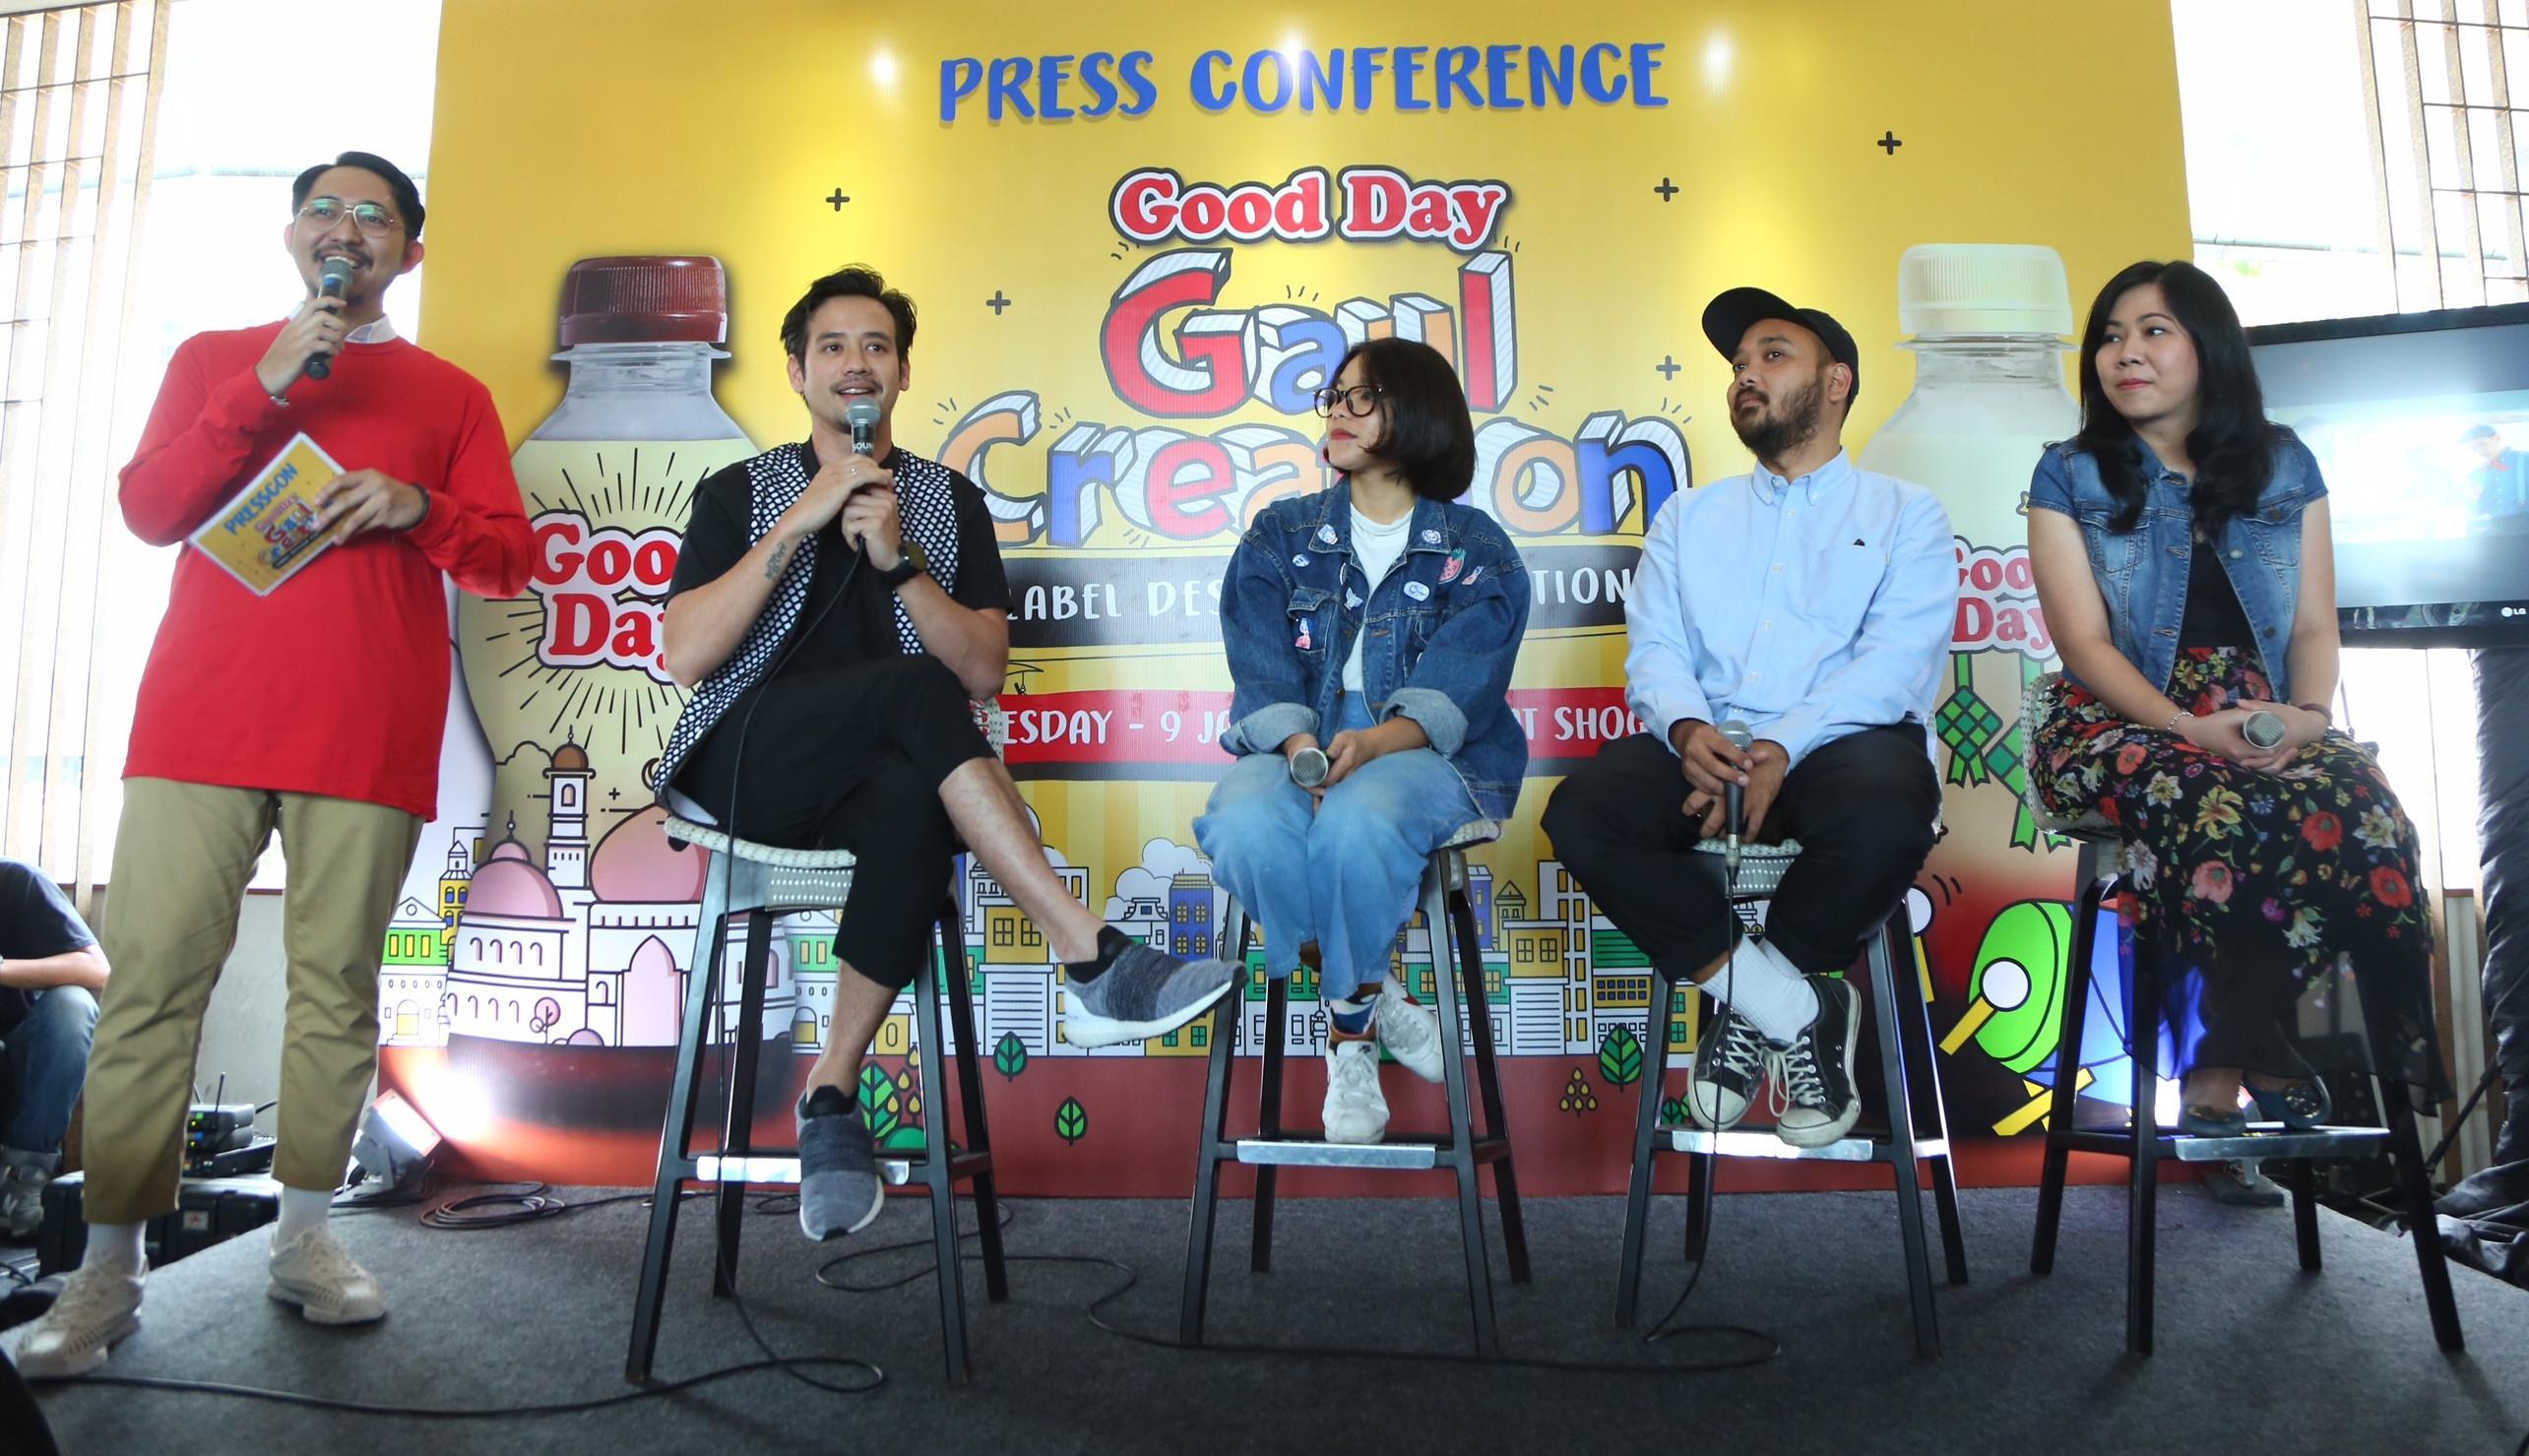 Acara press conference Good Day Gaul Creation di Kuningan, Jakarta Selatan. (Fotografer: Daniel Kampua/Bintang.com)